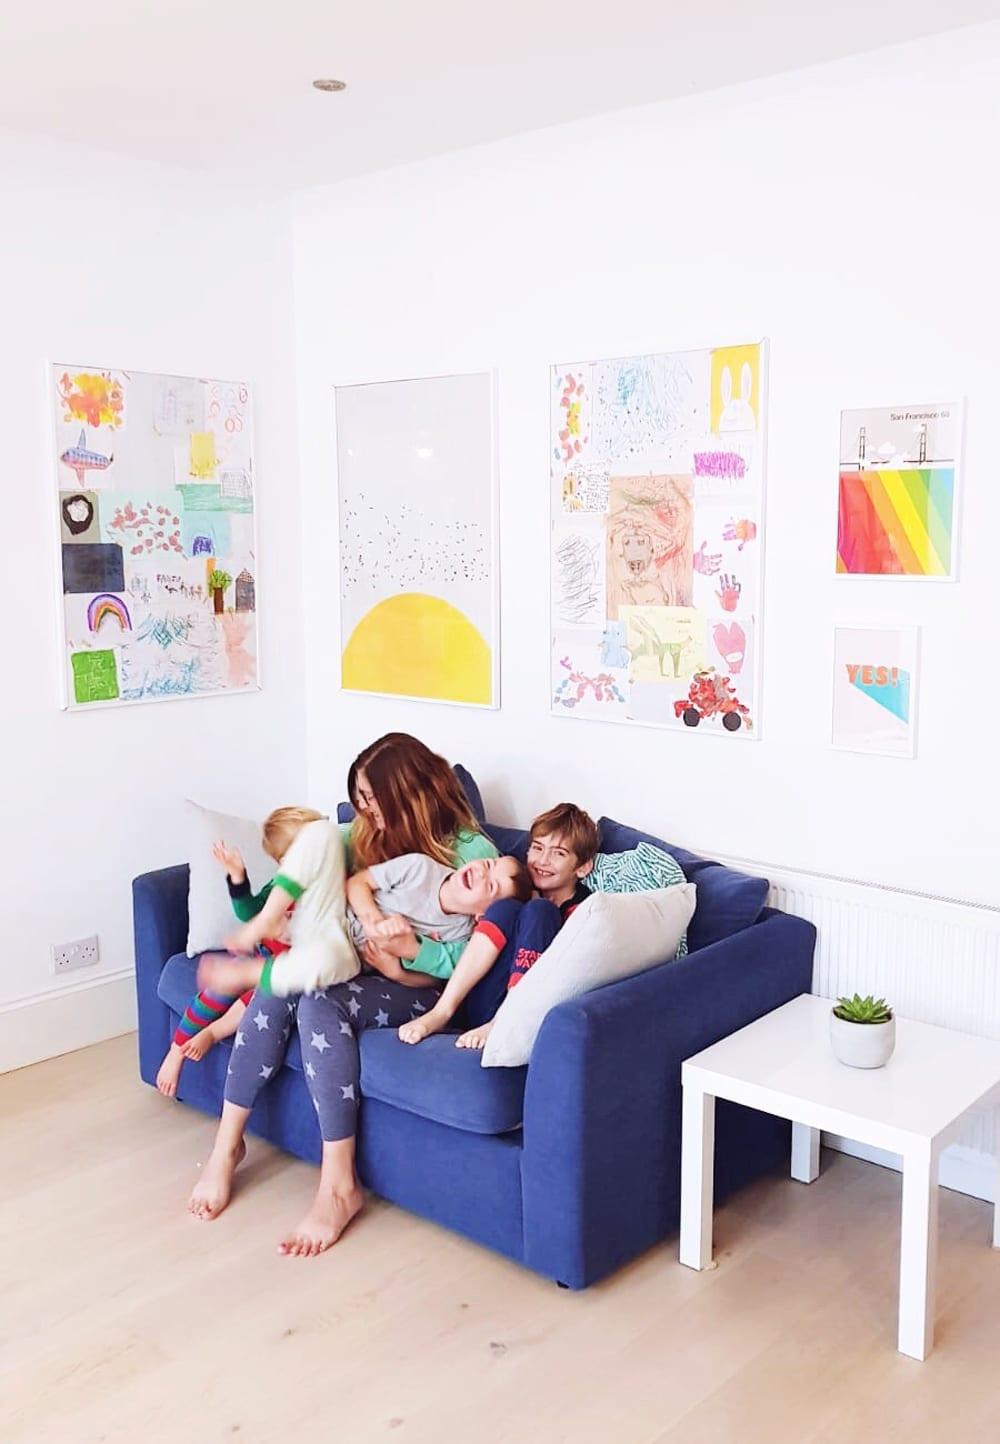 displaying children's artwork